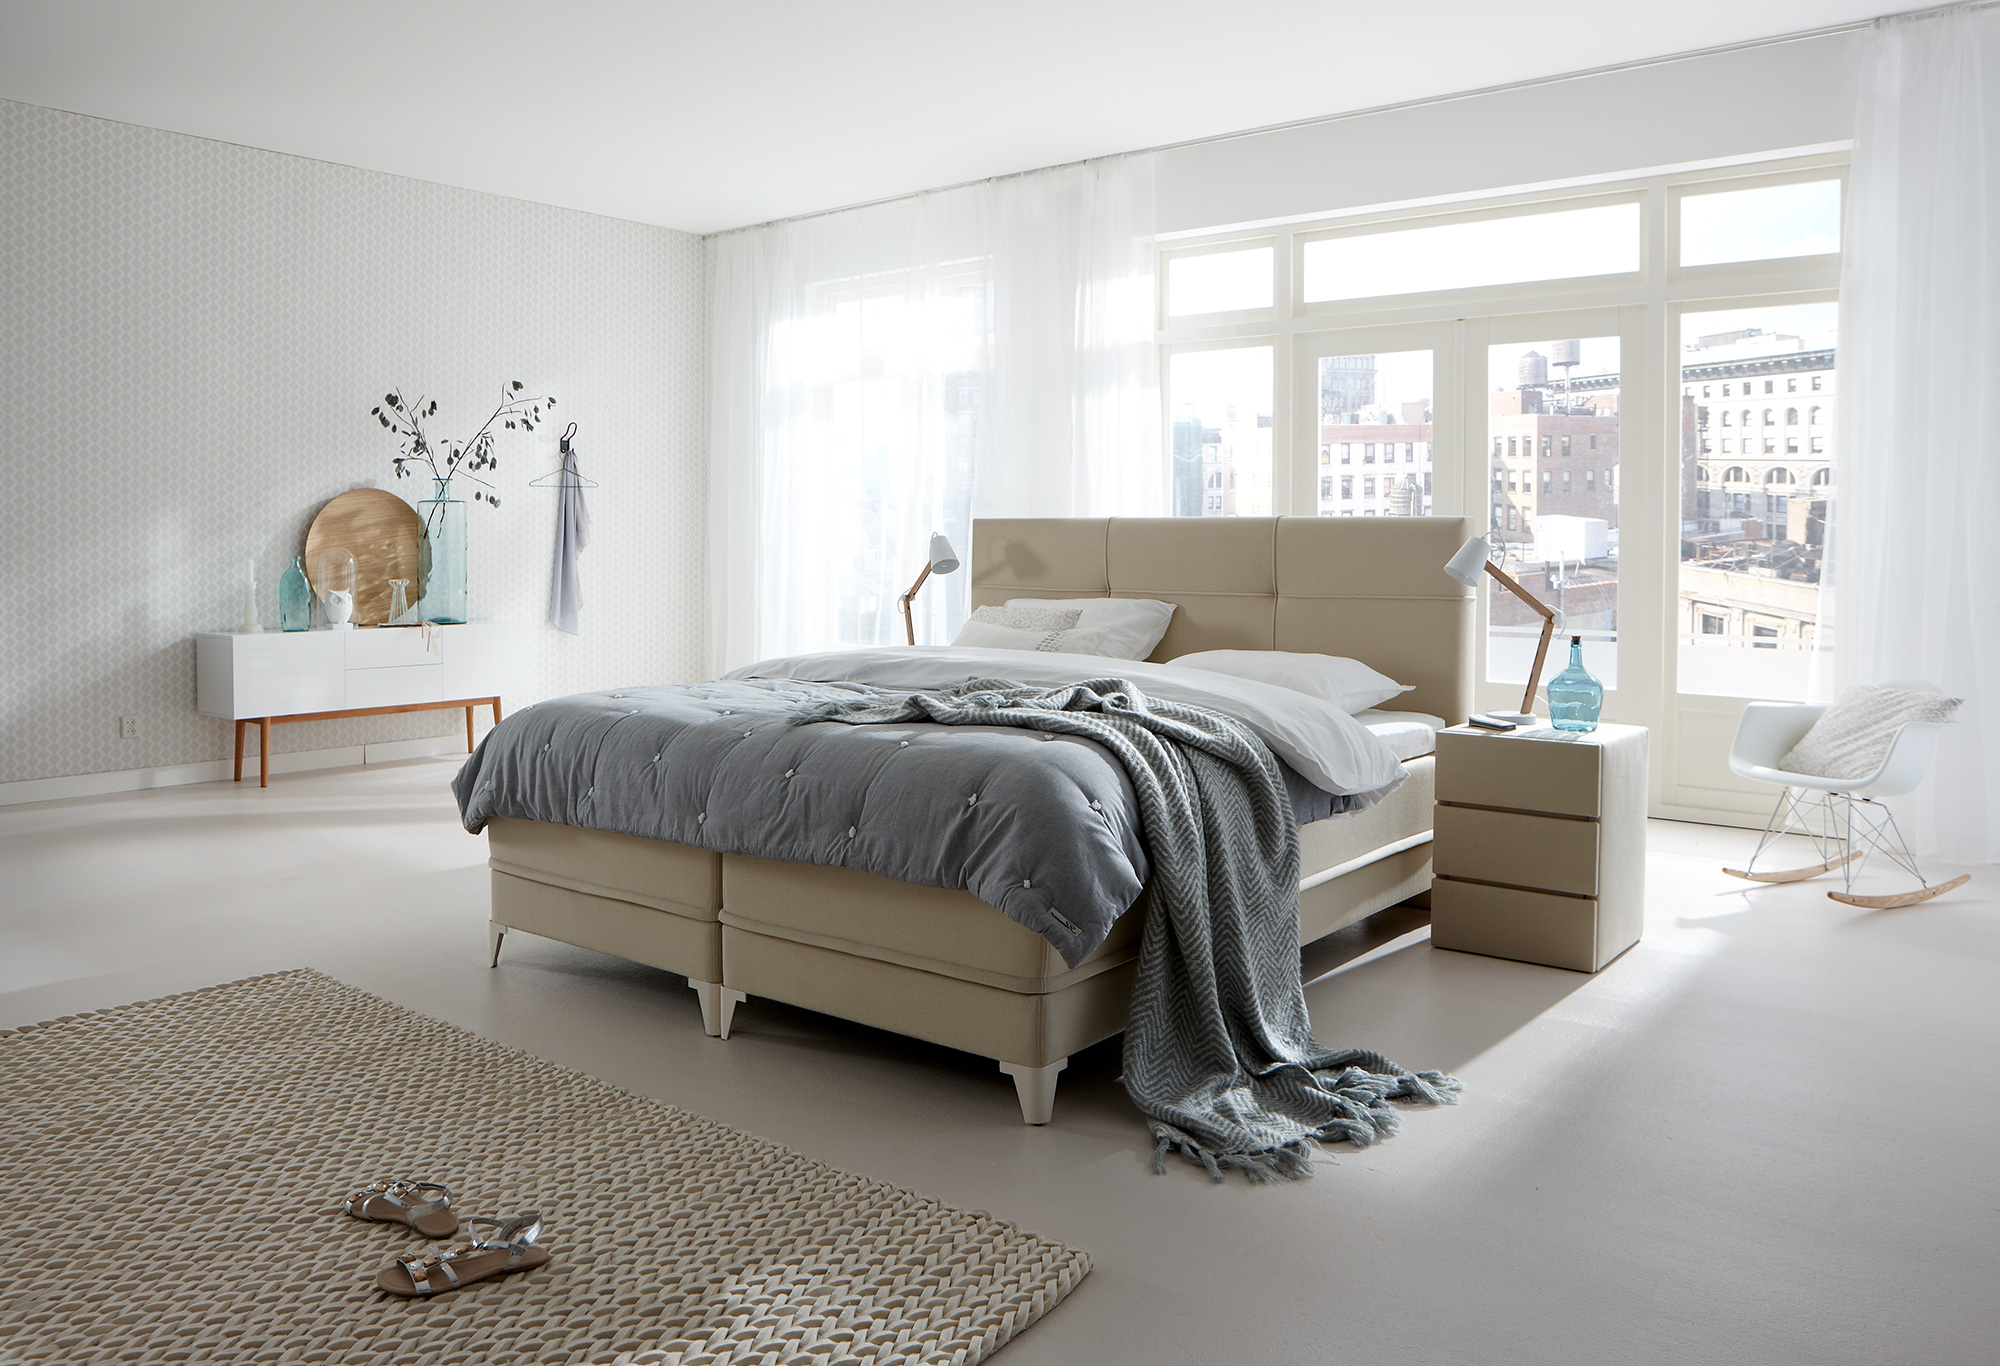 boxspring lifestyle 600 s swiss sense. Black Bedroom Furniture Sets. Home Design Ideas